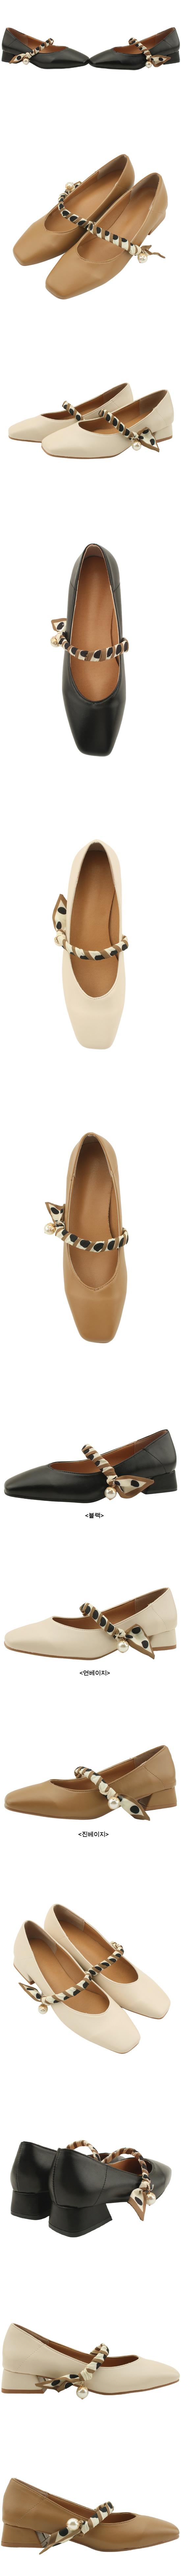 Silk Mary Jane Low Heel Pumps Light Beige